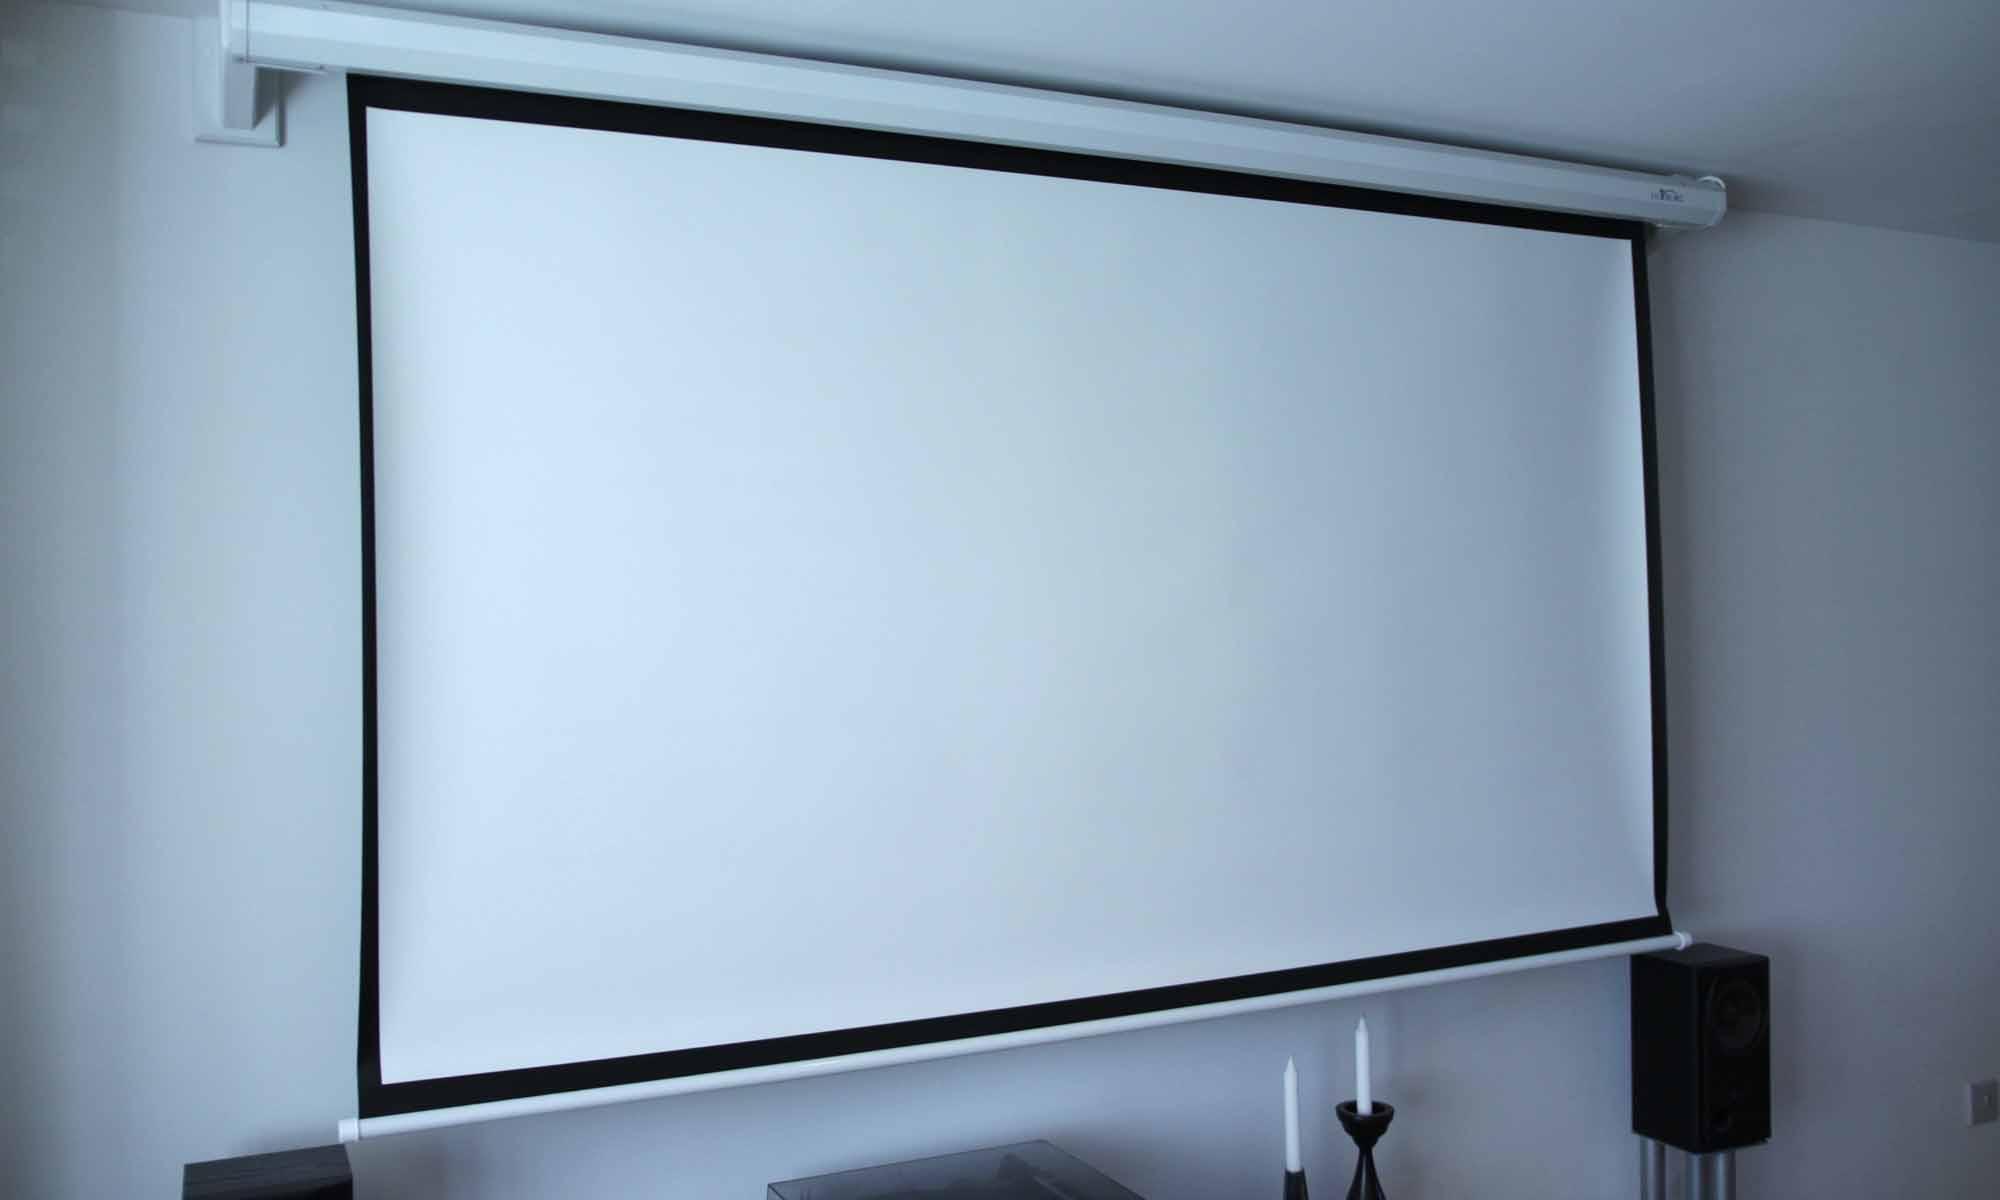 Installing A Projector Screen